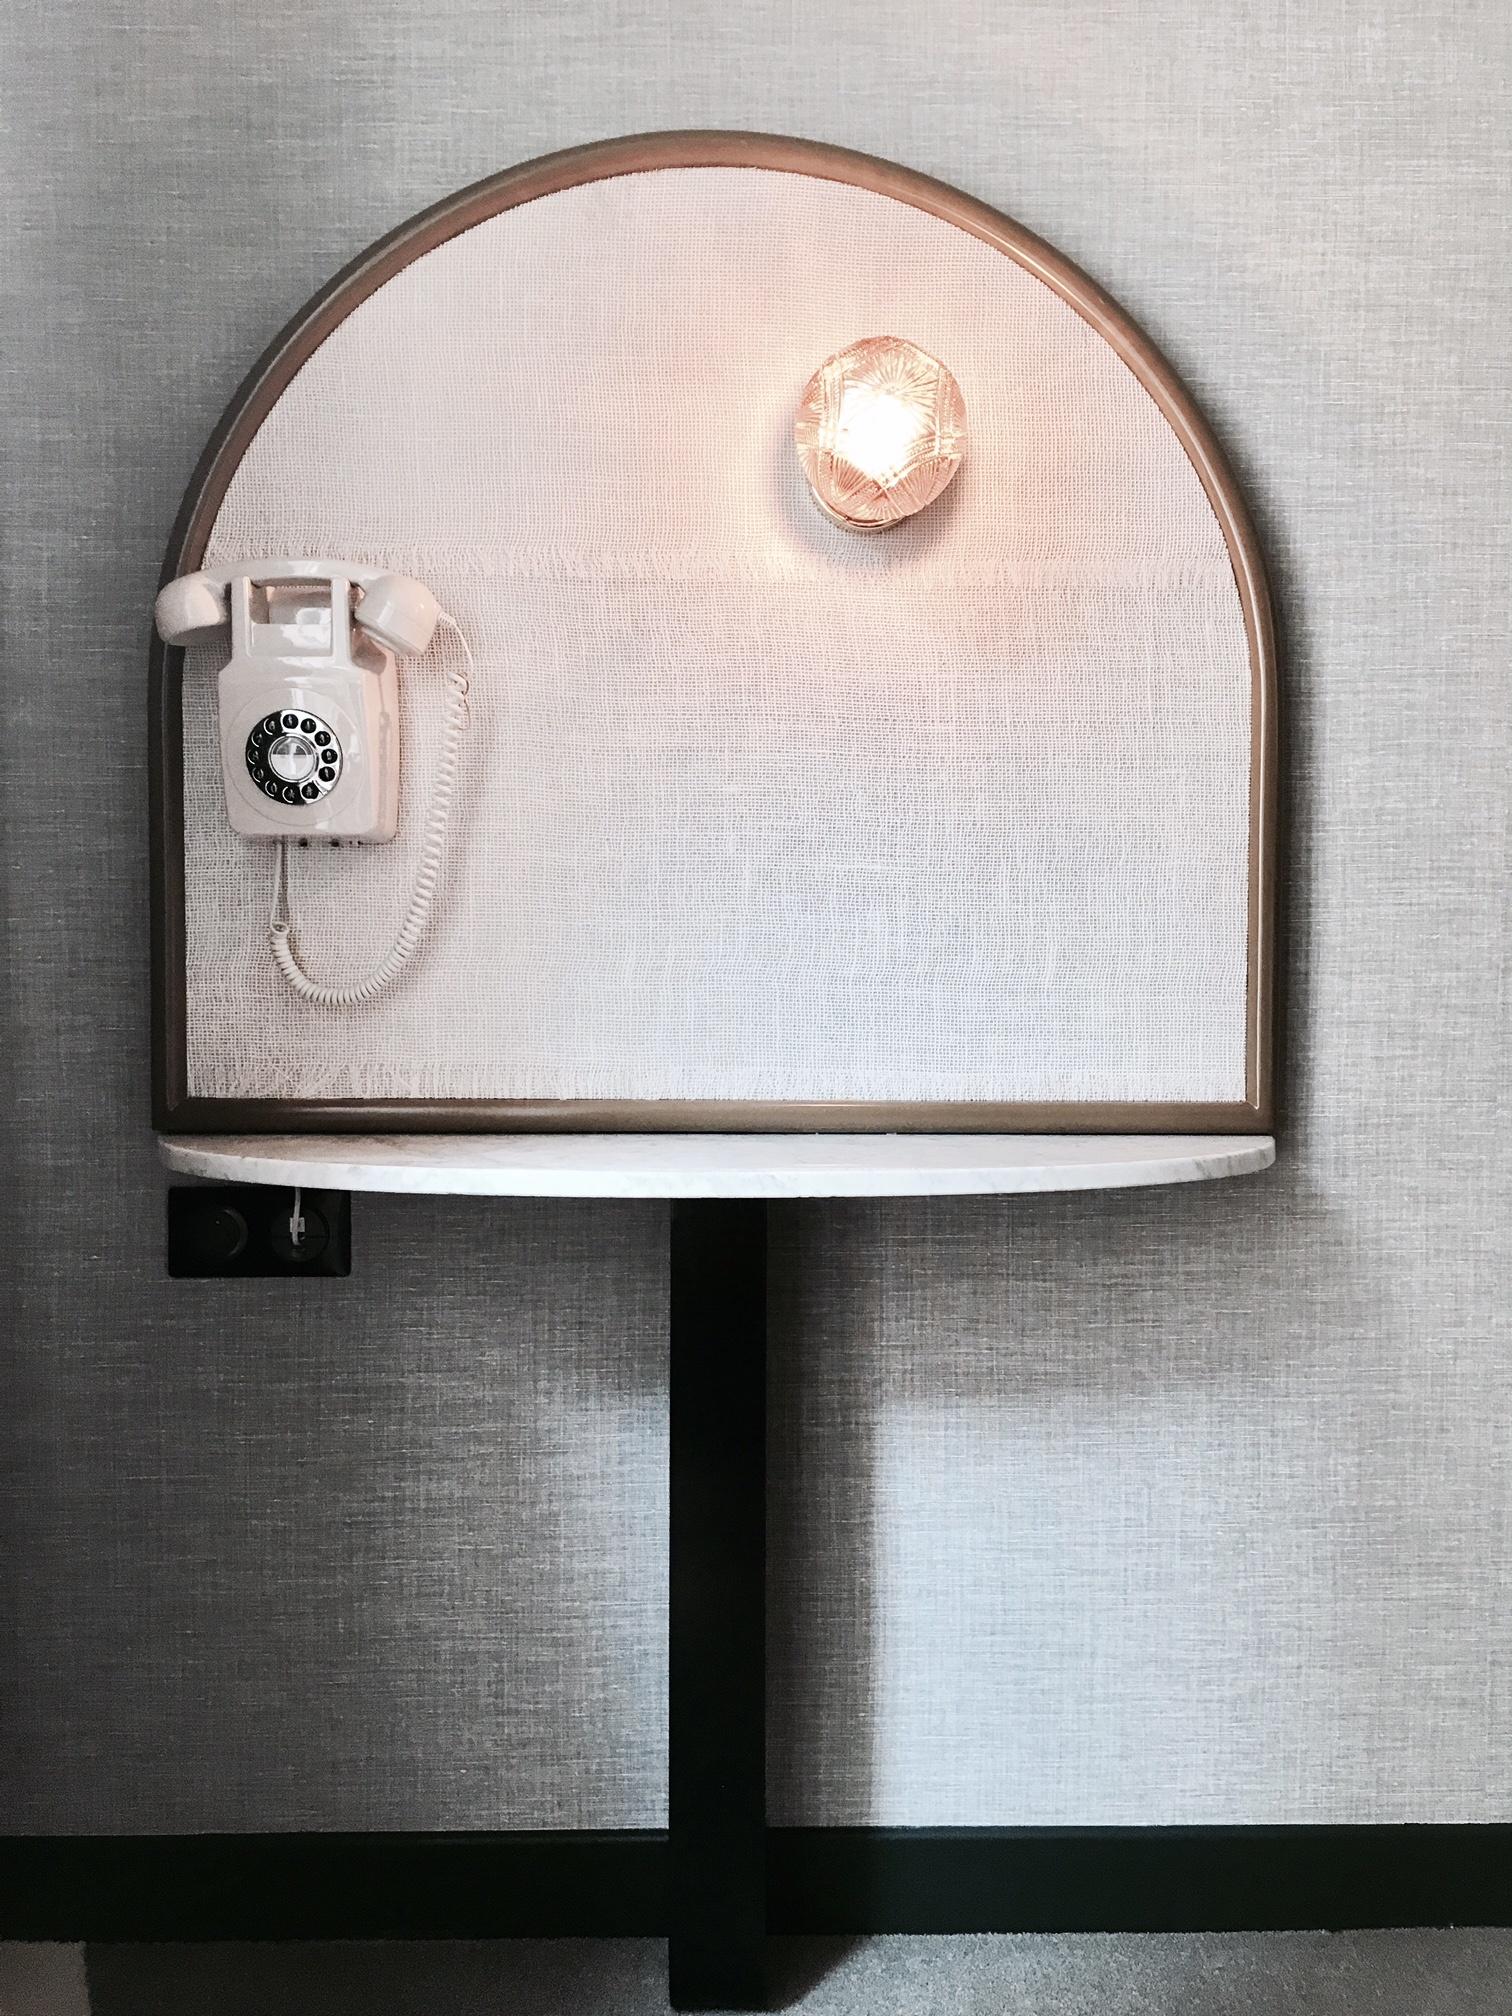 Отель в Париже в стиле ар-деко (галерея 11, фото 4)